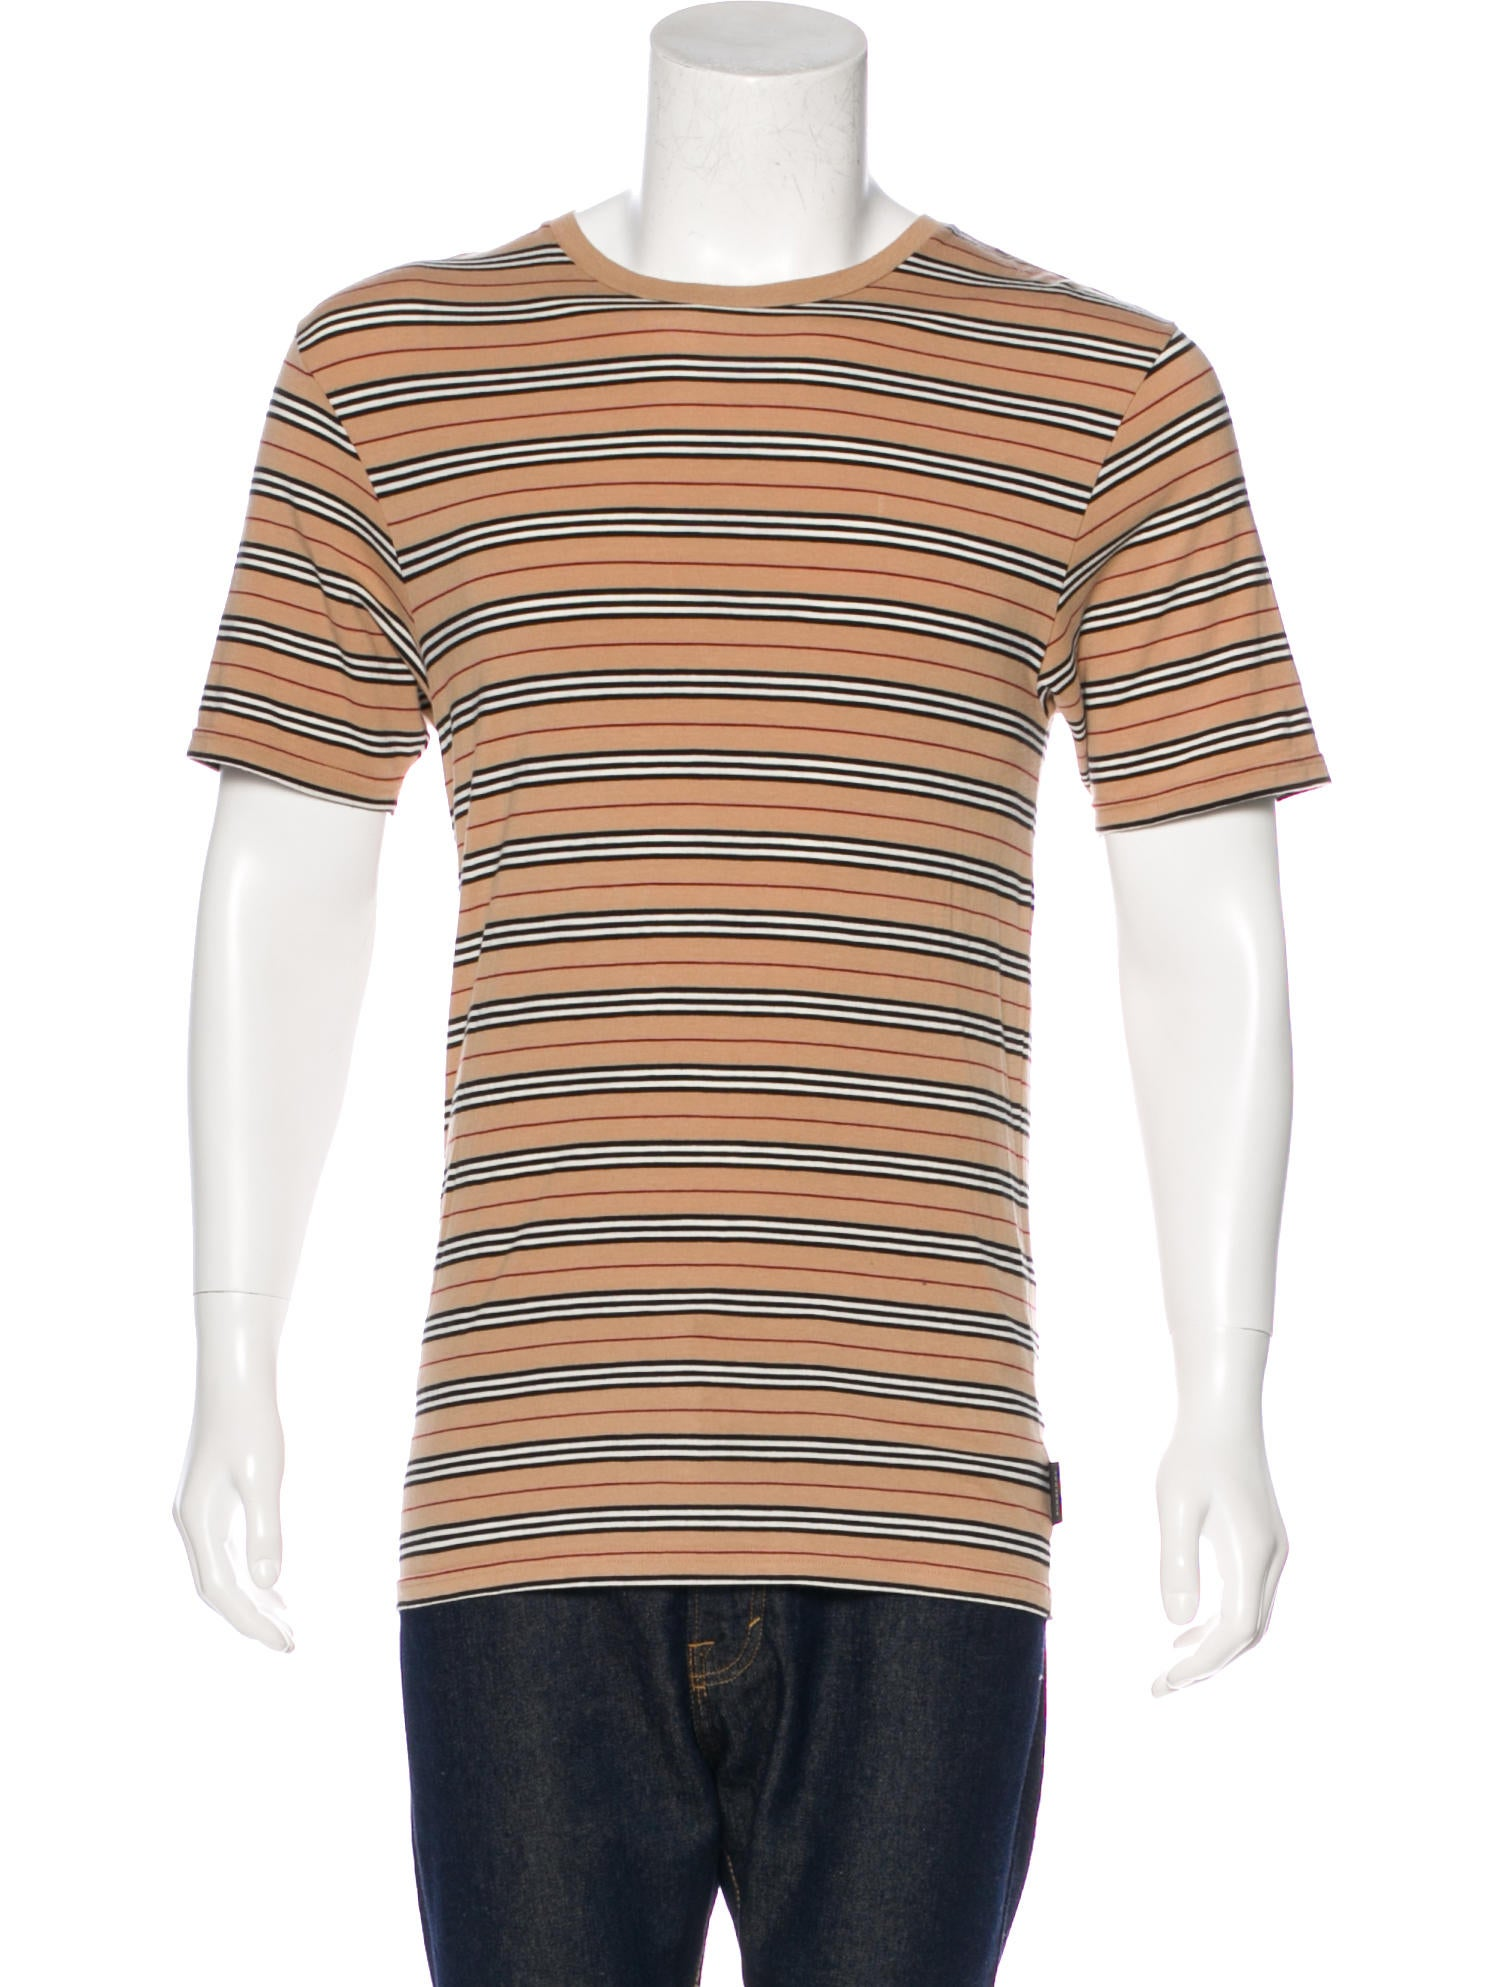 Burberry London Striped T Shirt Clothing Wburl28414